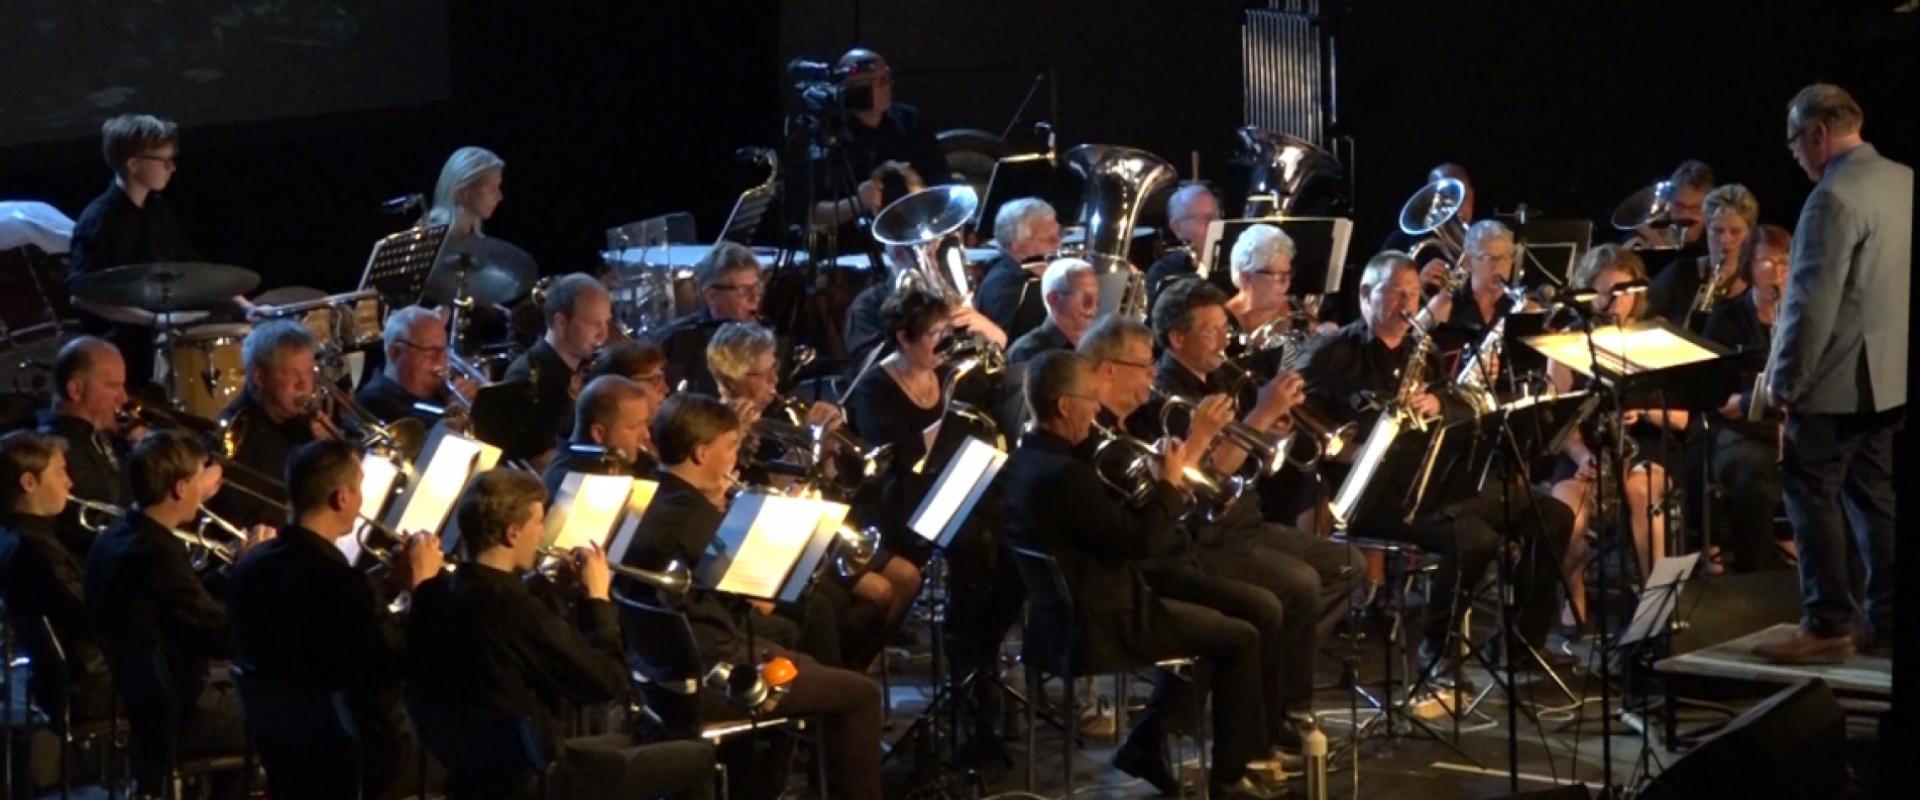 Muziekvereniging Amicitia Kortenhoef